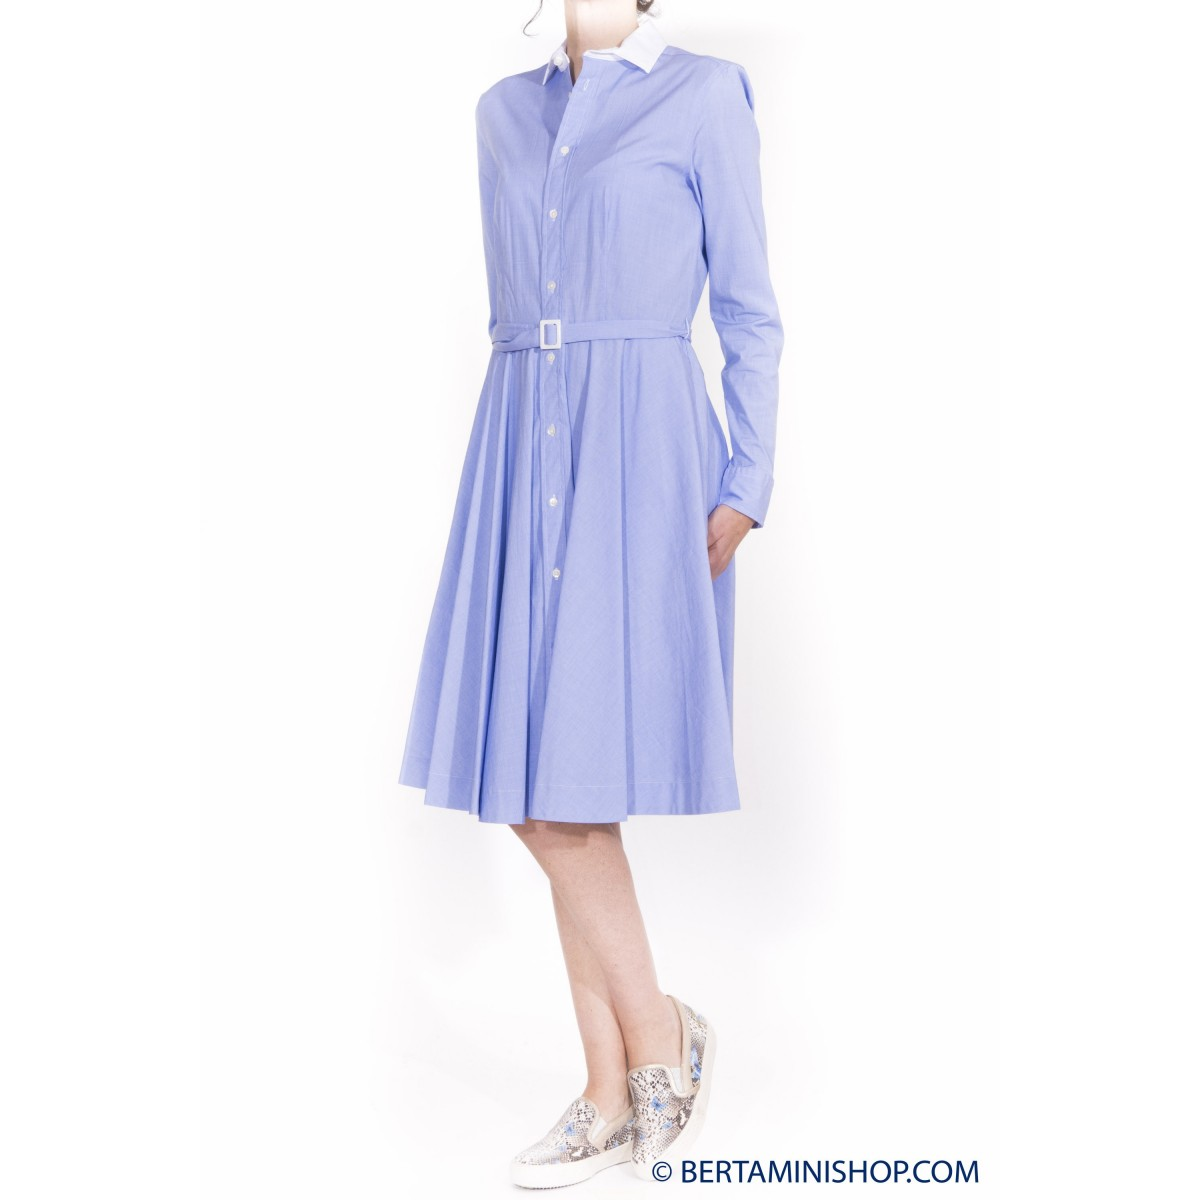 Camicia manica corta donna Ralph lauren - V33ih733bh733